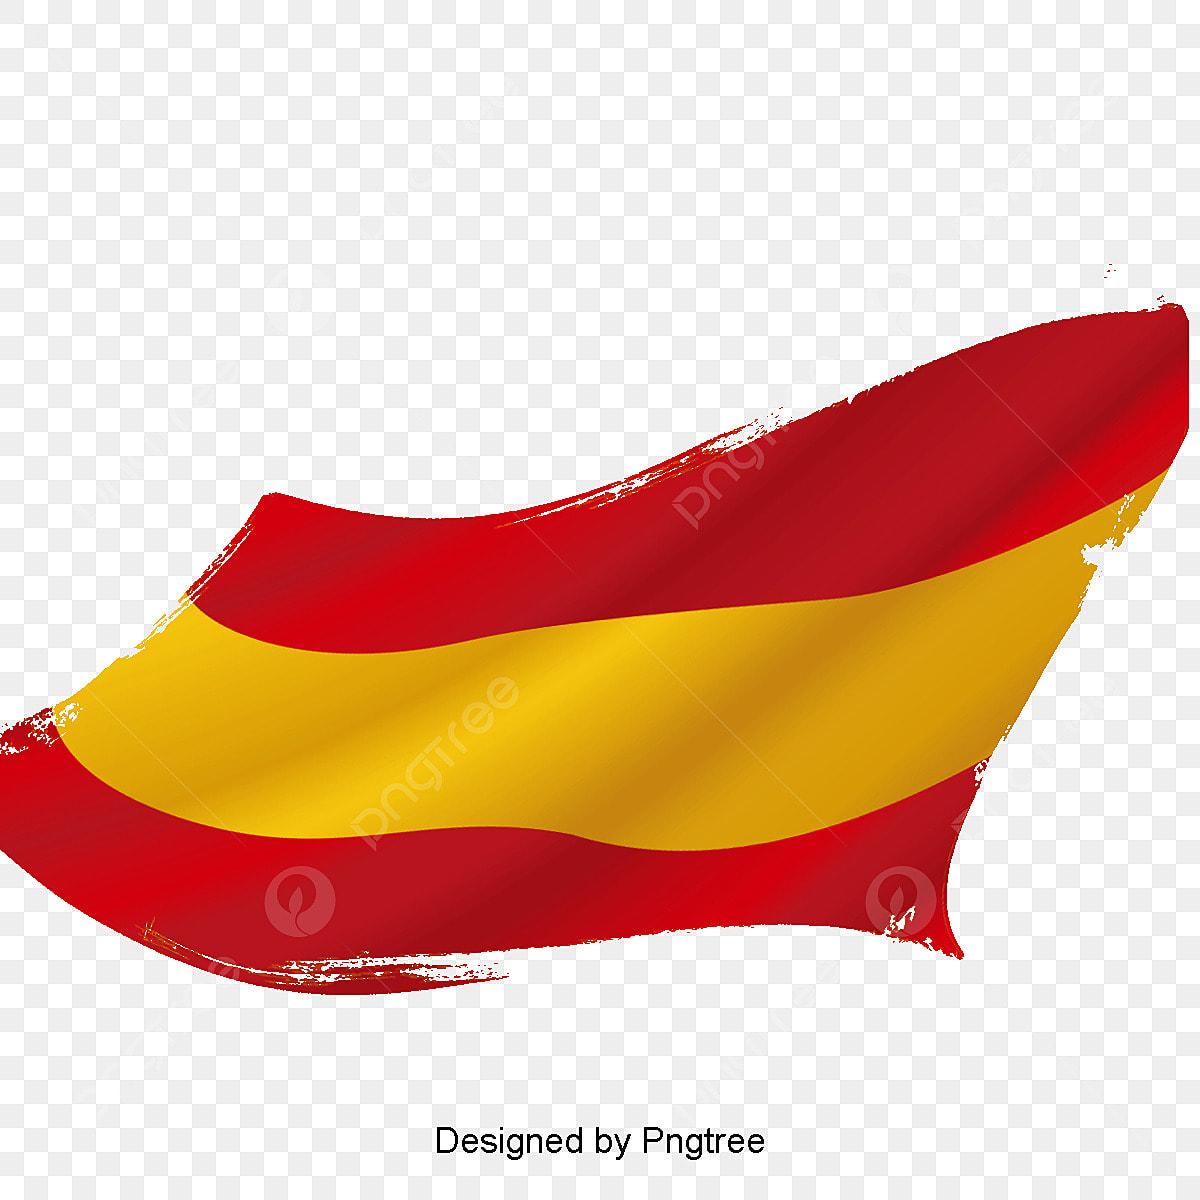 Bandera Espanola Vector Material Espana Bandera Vector De